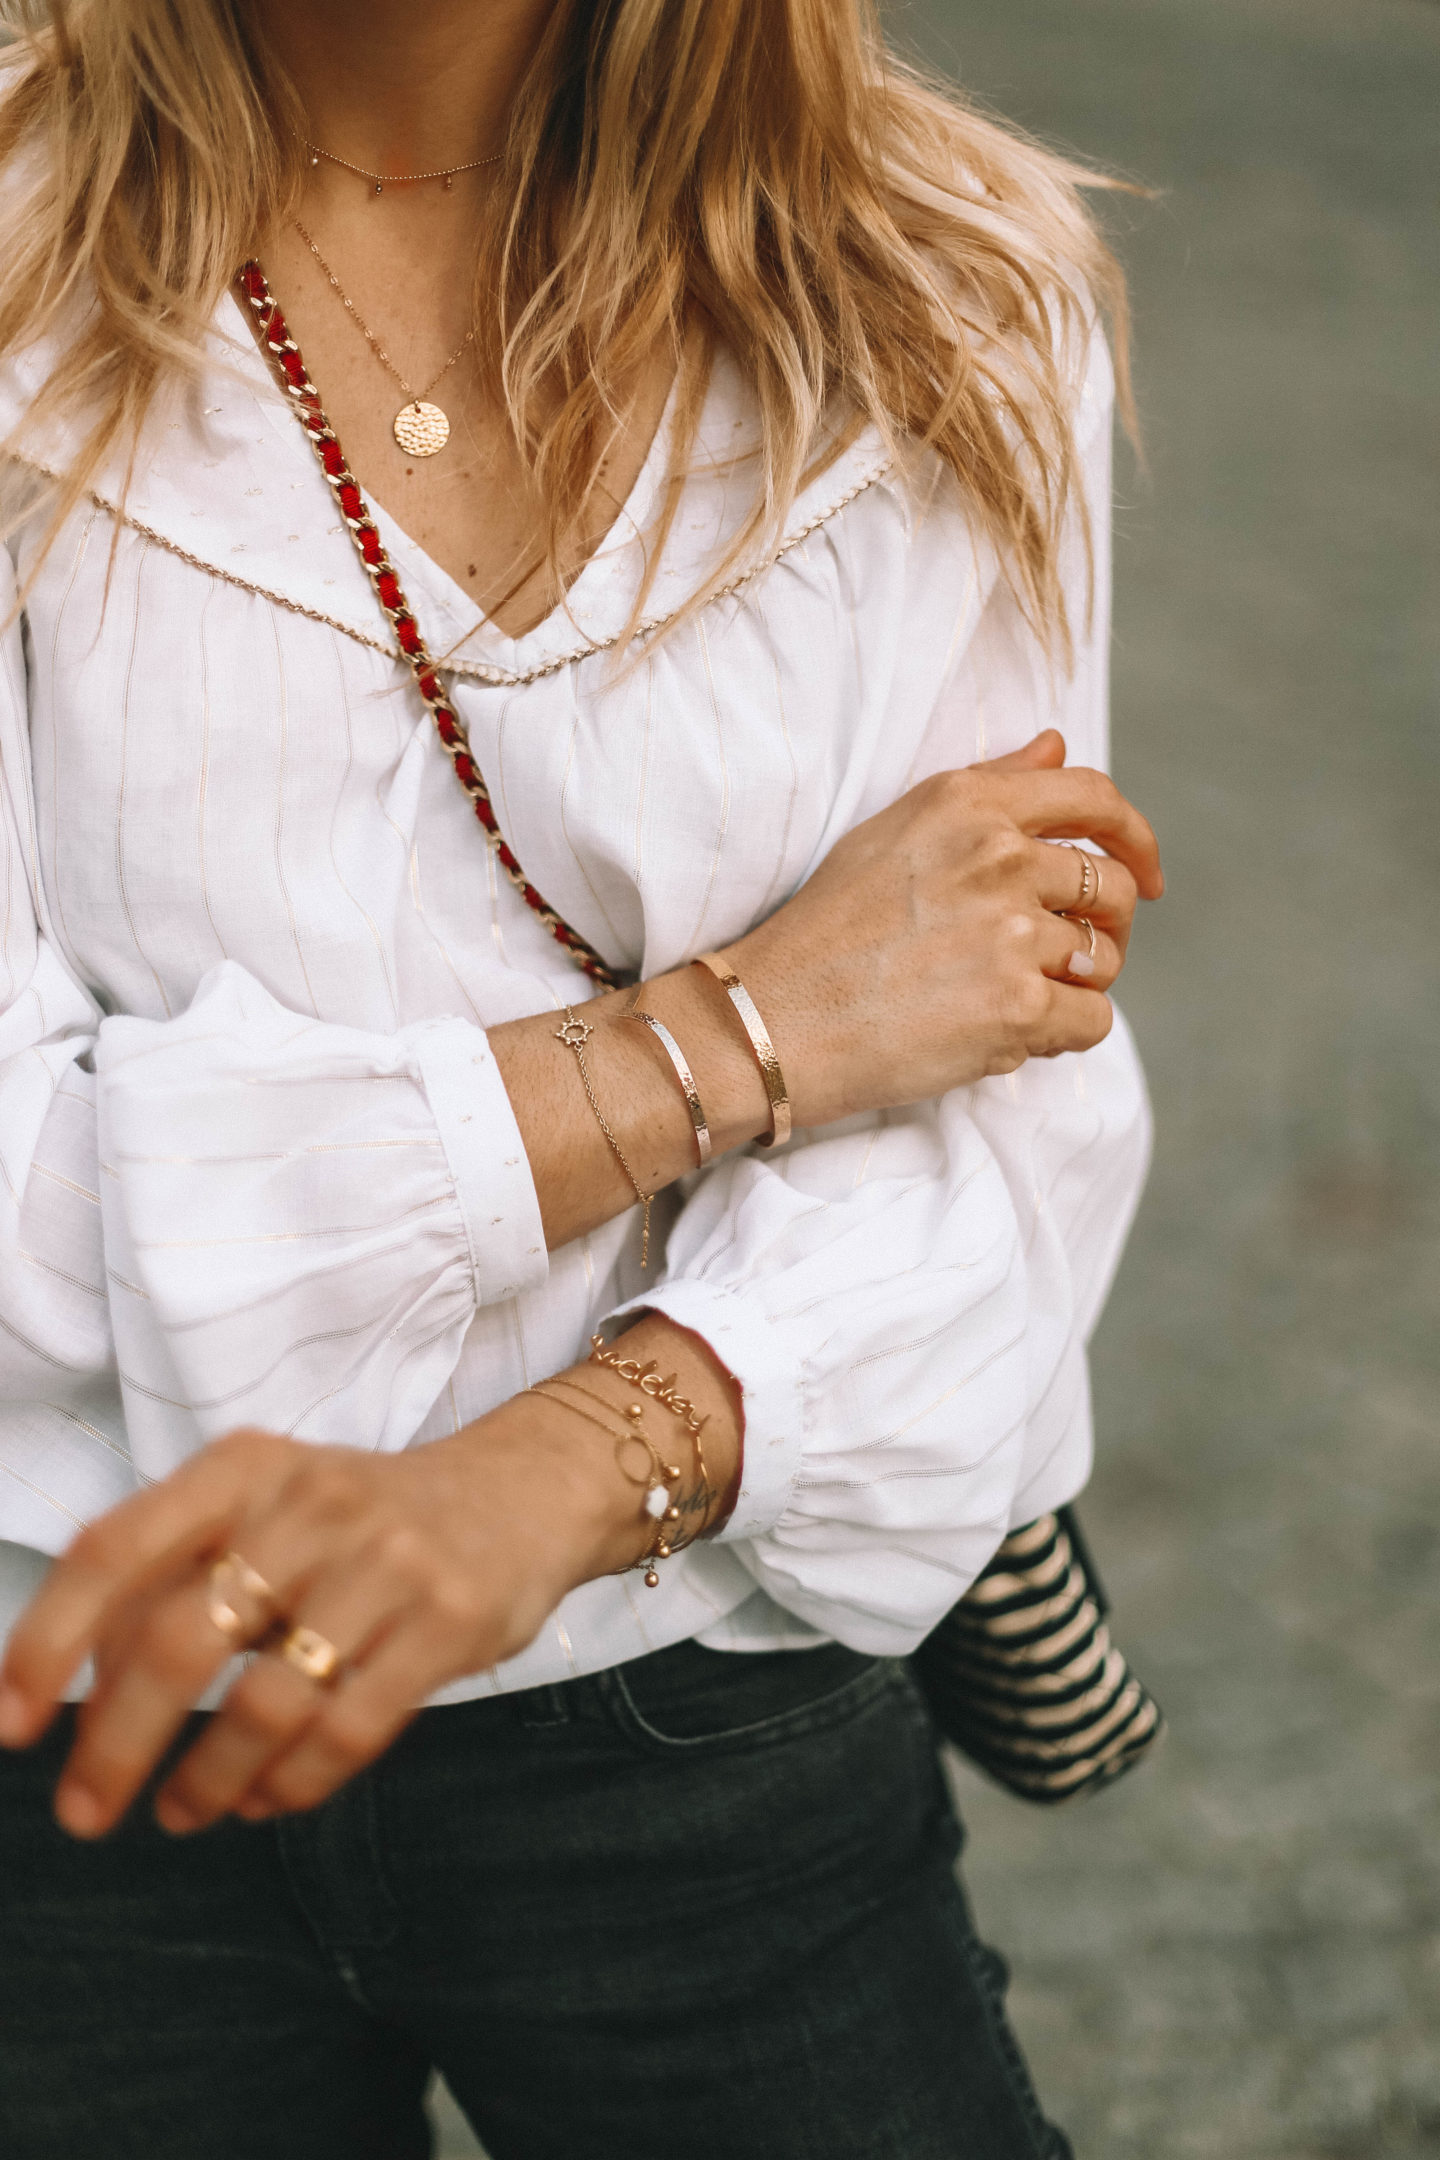 Bijoux Atelier Paulin - Blondie Baby blog mode Paris et voyages